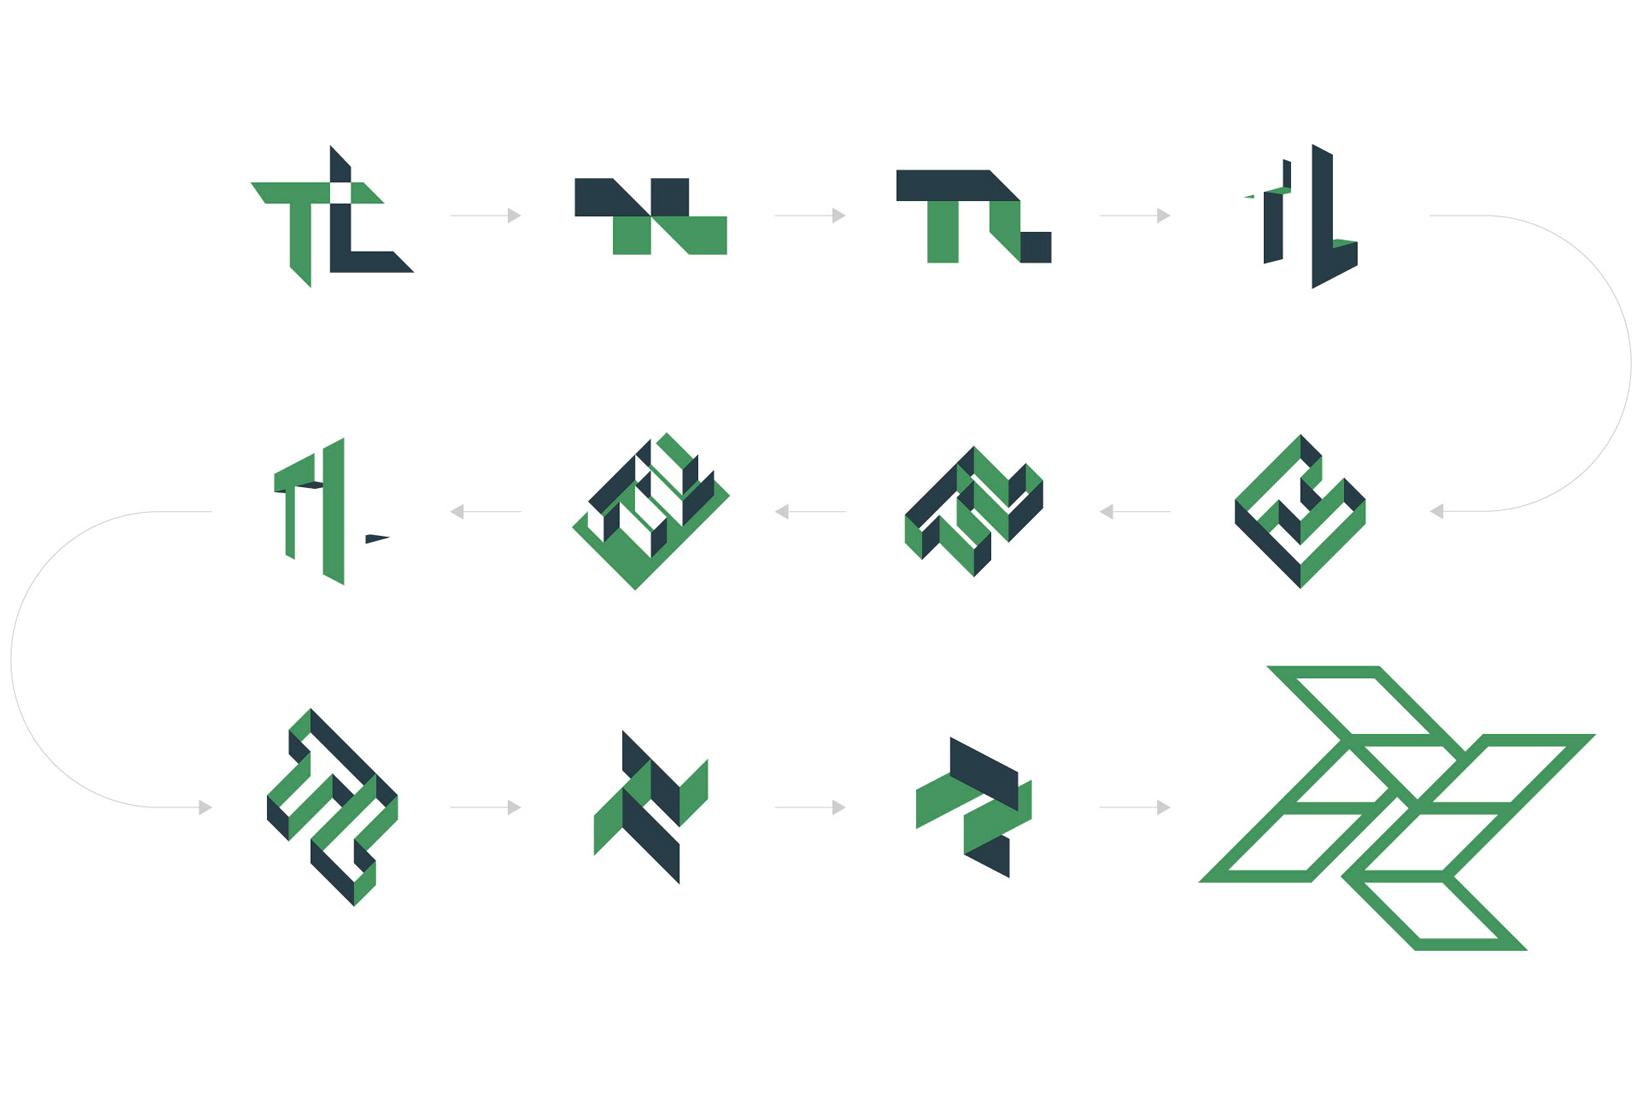 Tesslach logotip isotip branding identitat corporativa disseny gràfic Vibranding